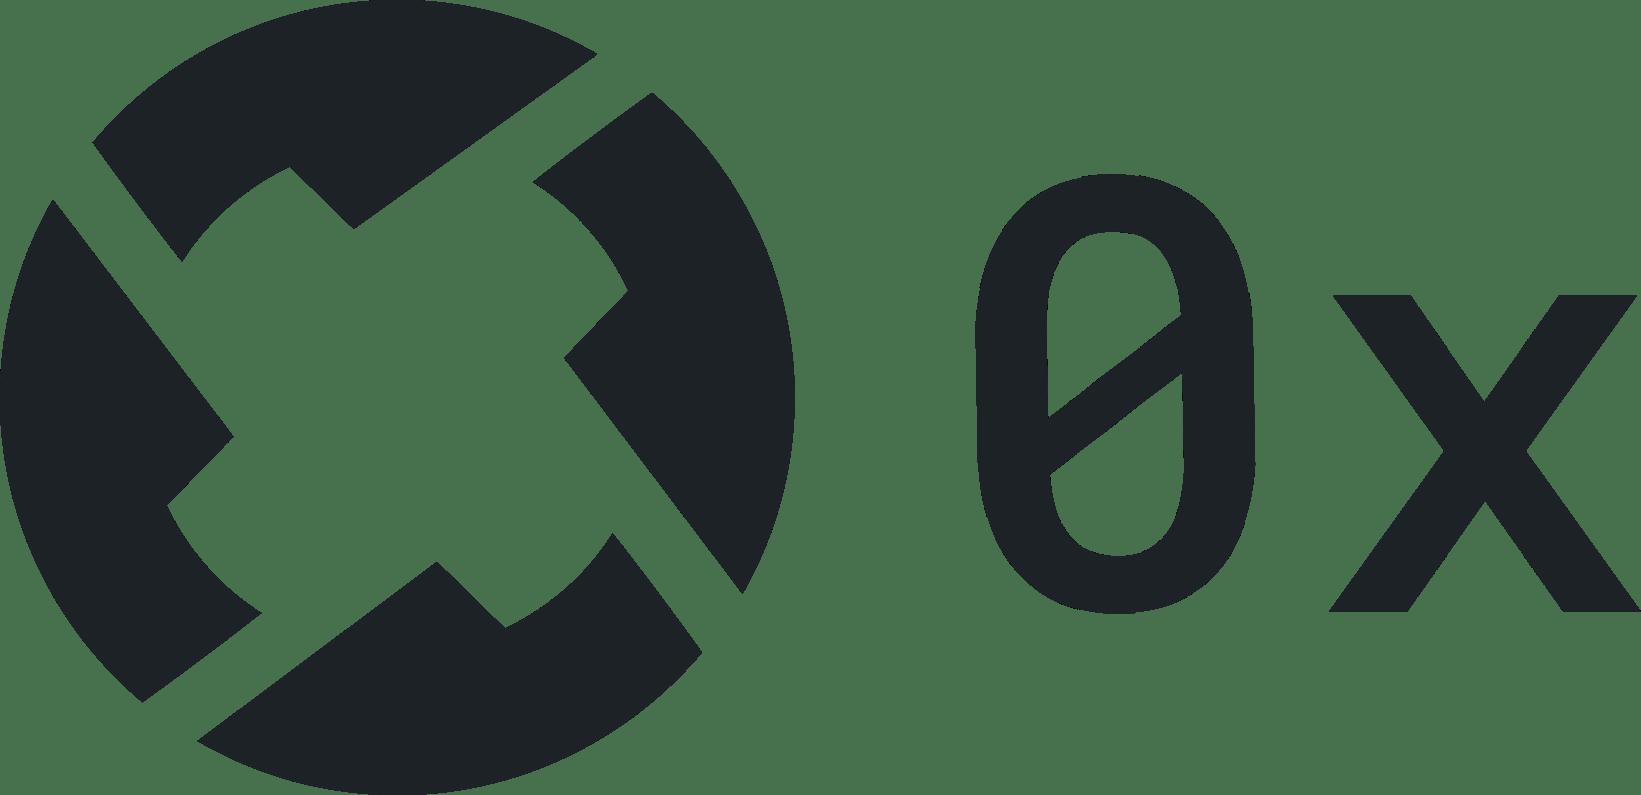 Etherdelta Zrx Bittrex Vs Coinbase – Flaires disseny floral